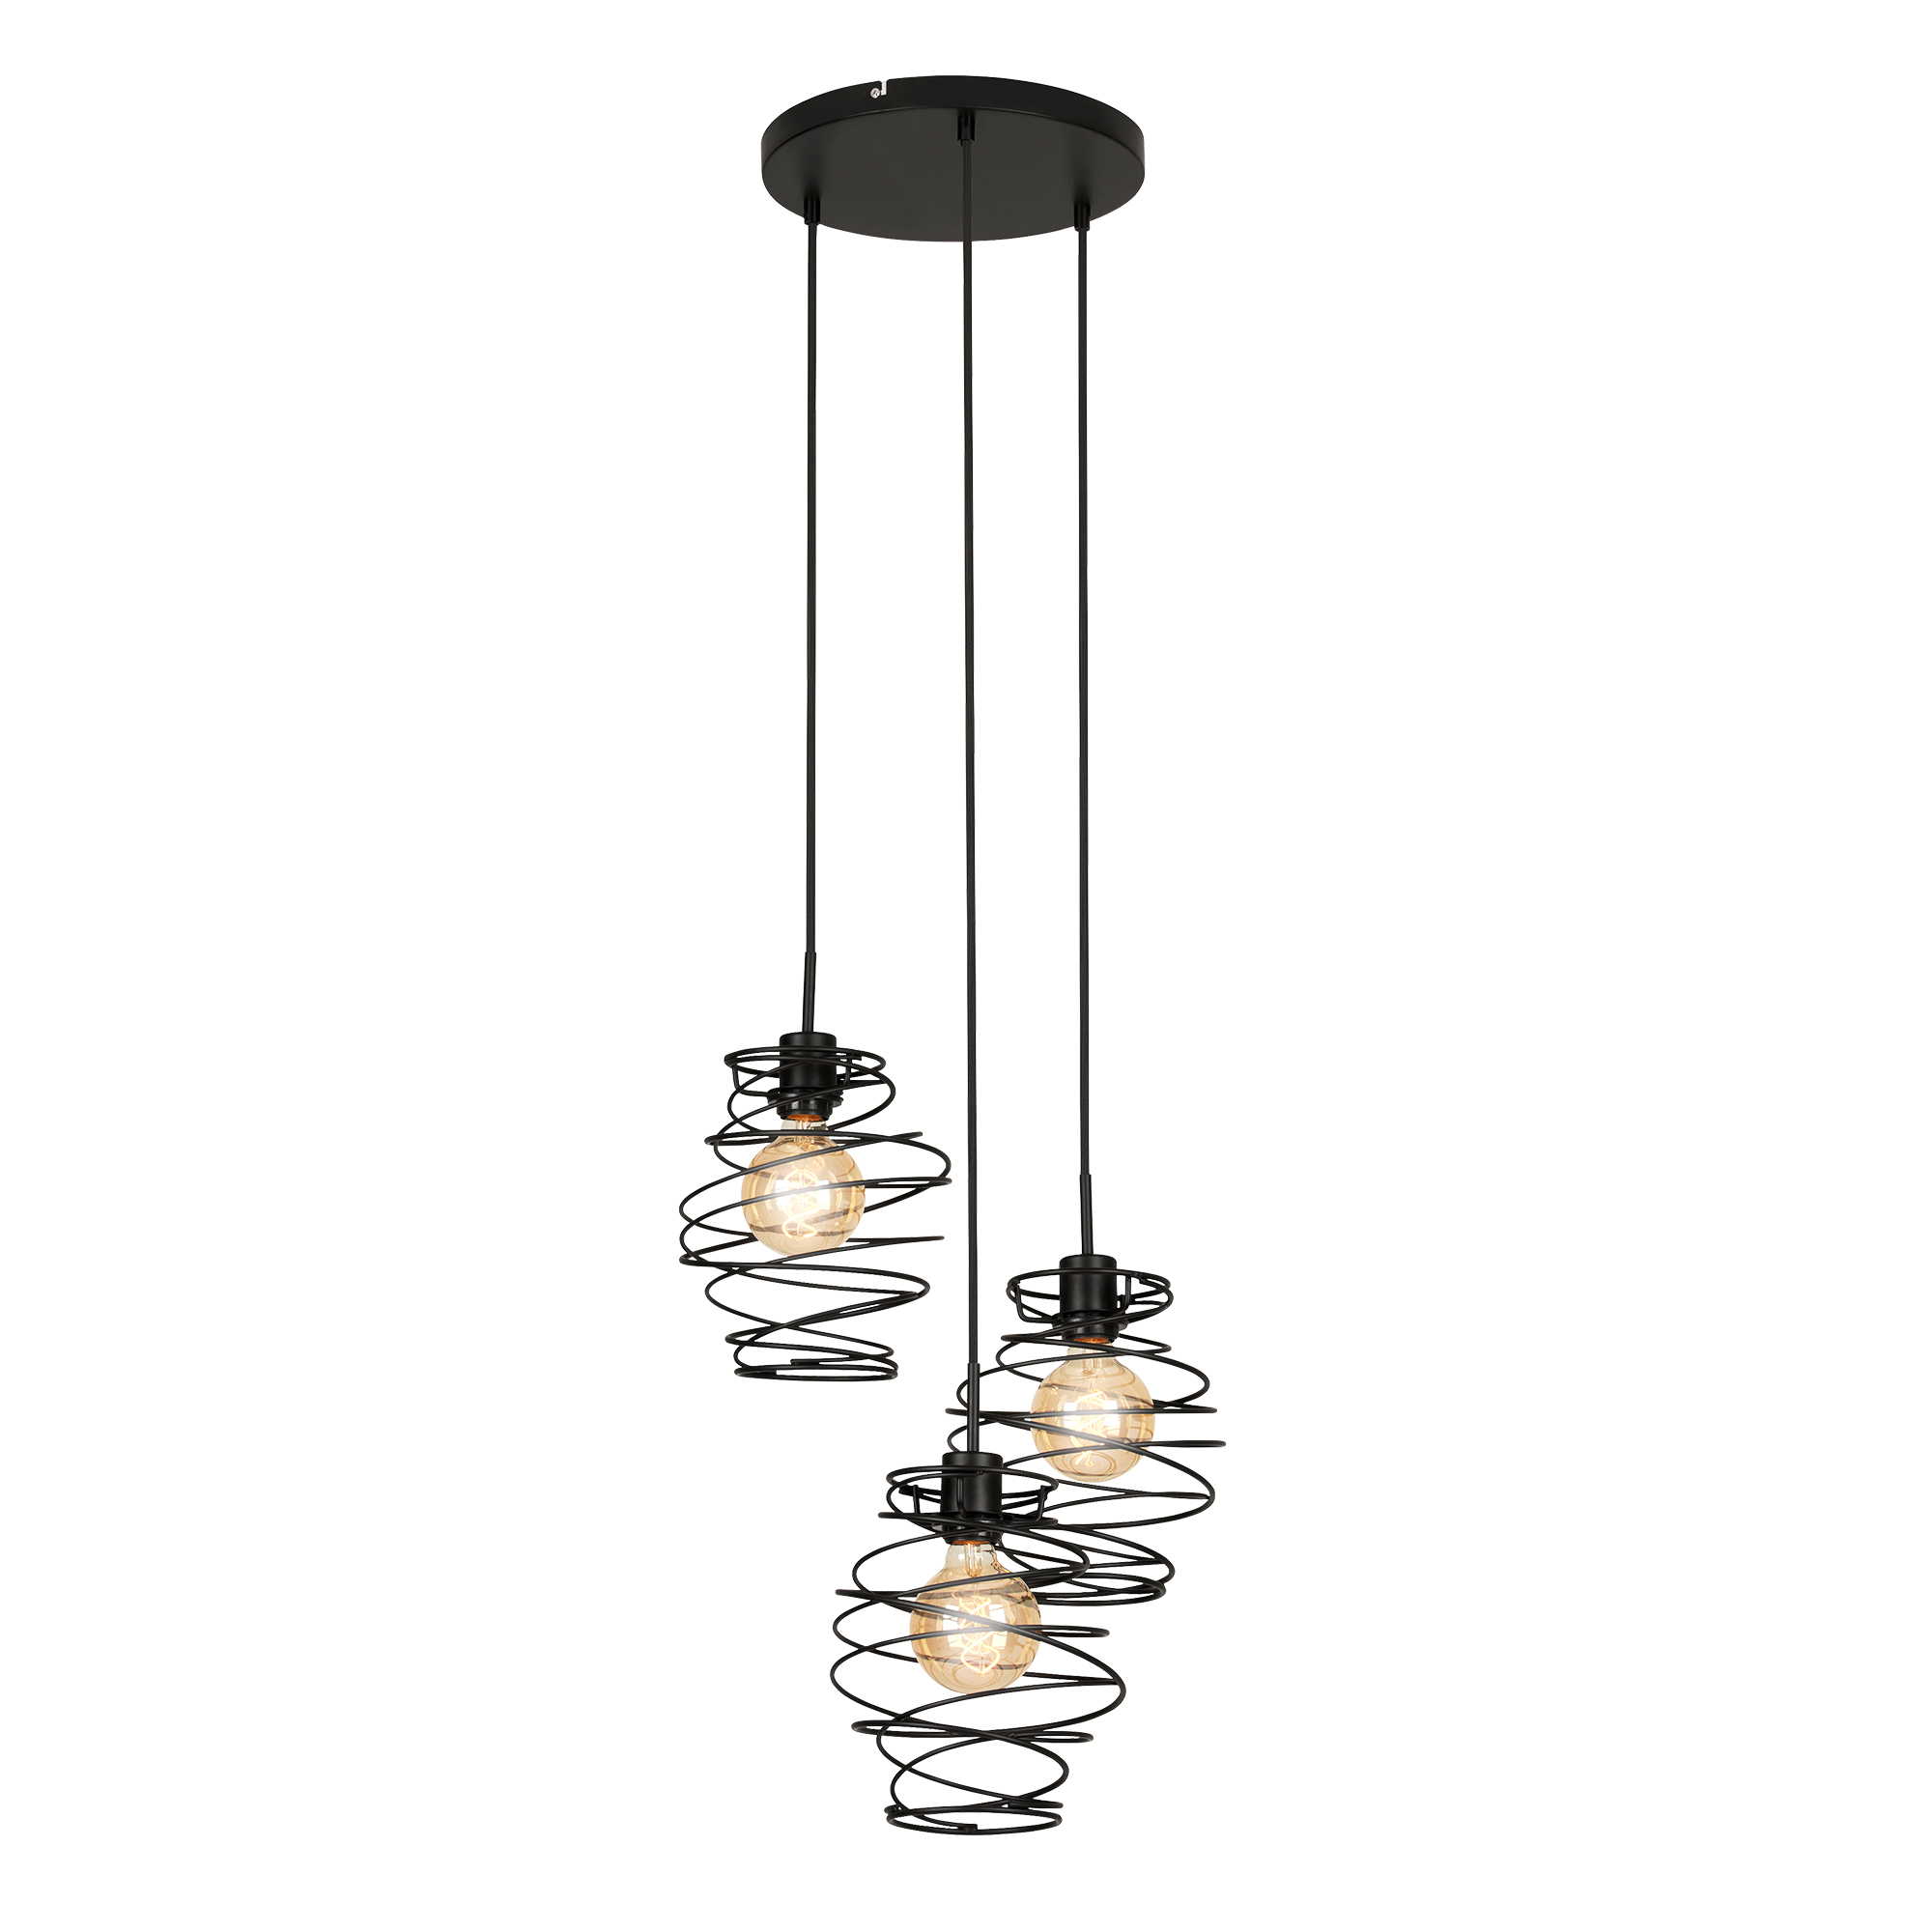 LED Spot Pendelleuchte, Ø 30 cm, max. 60 W, Schwarz